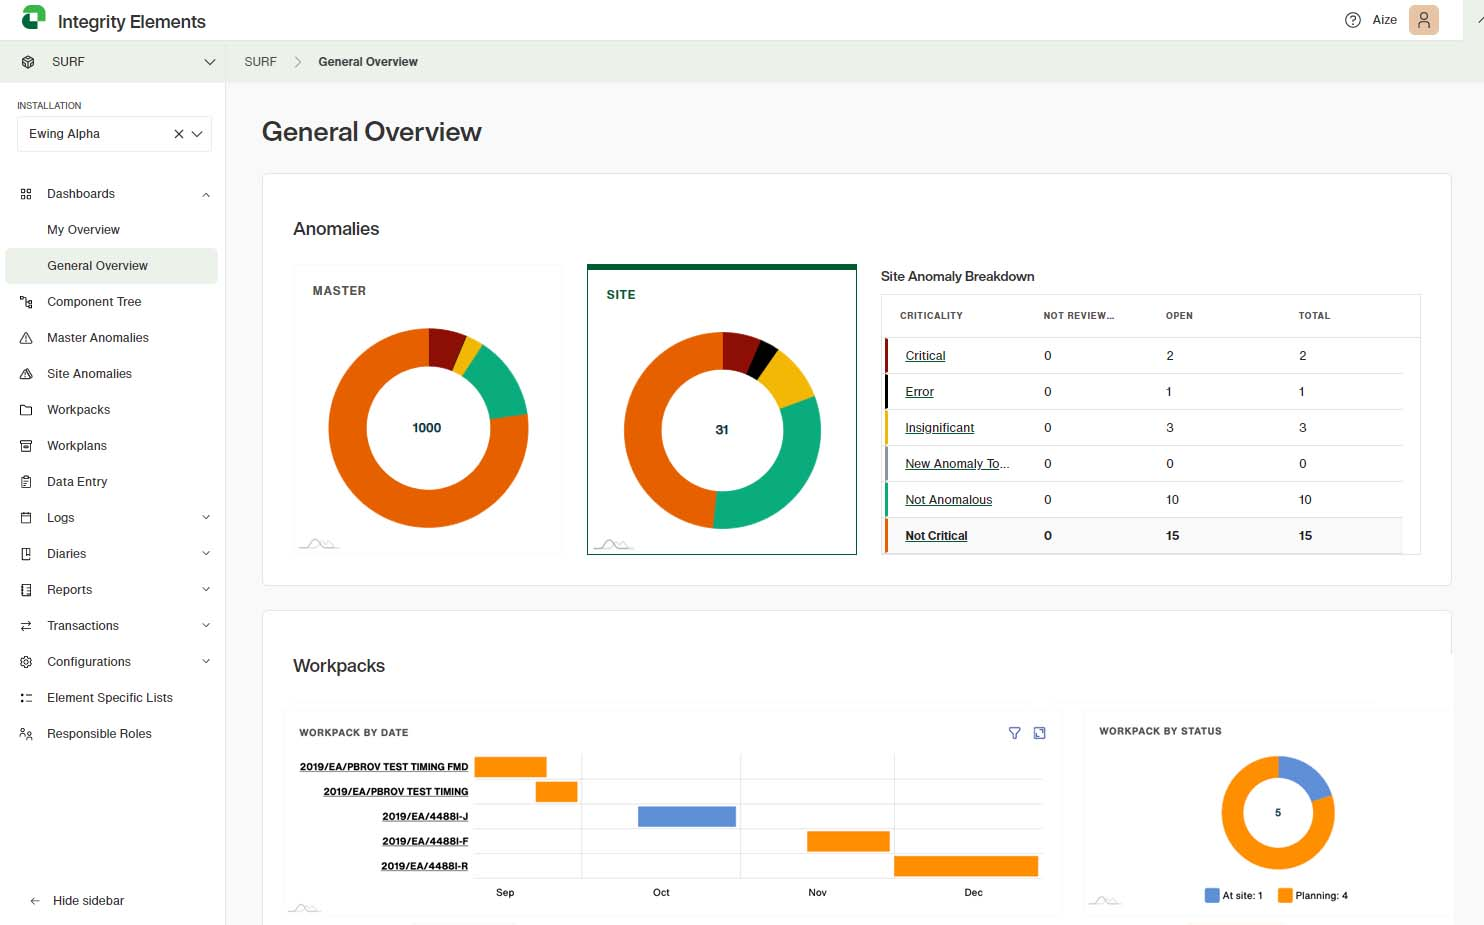 Integrity Elements dashboard NEW